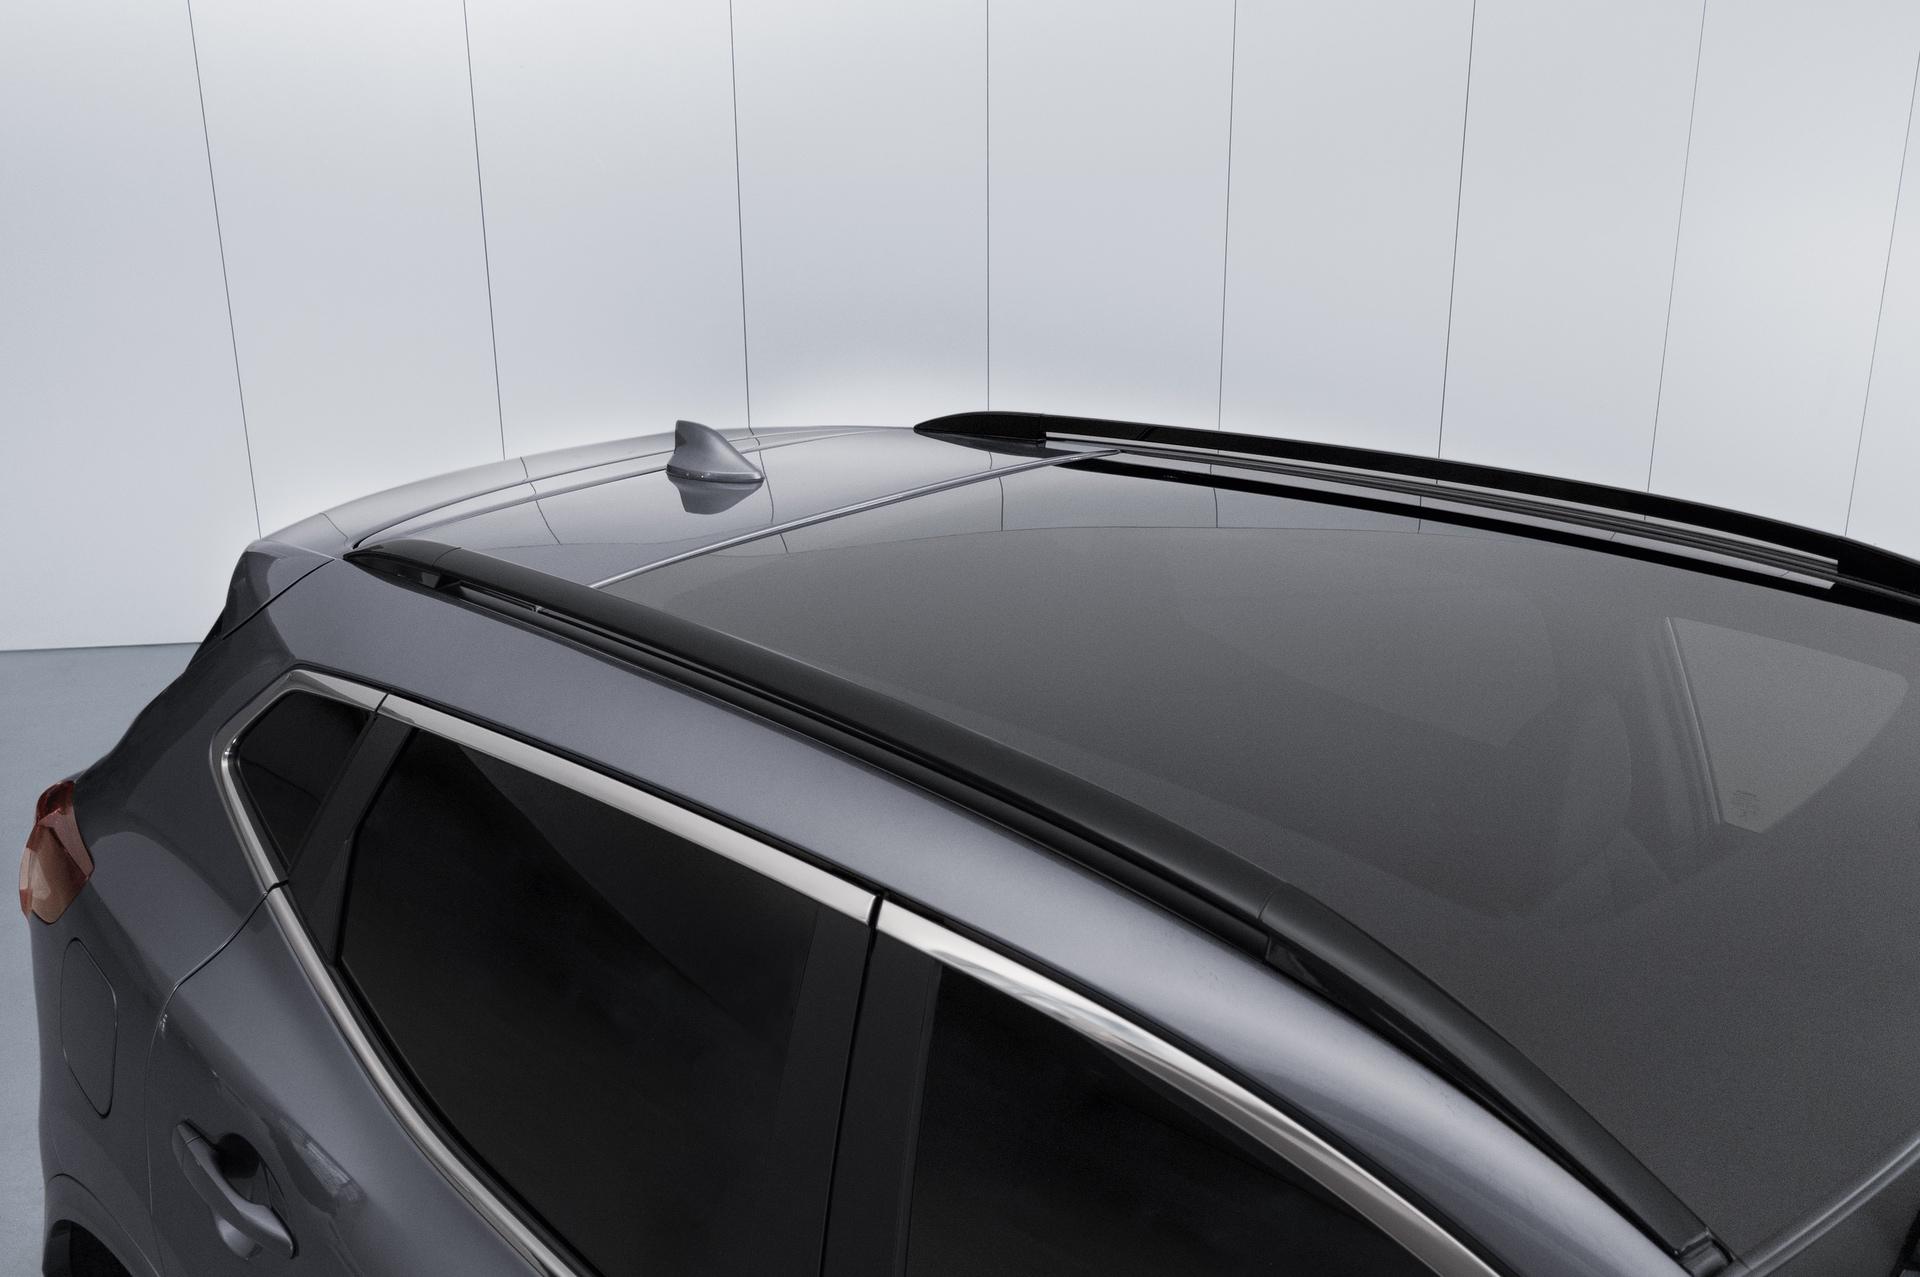 Jan.-7-10am-CET-QASHQAI-N-TEC-Edition-roof-rails